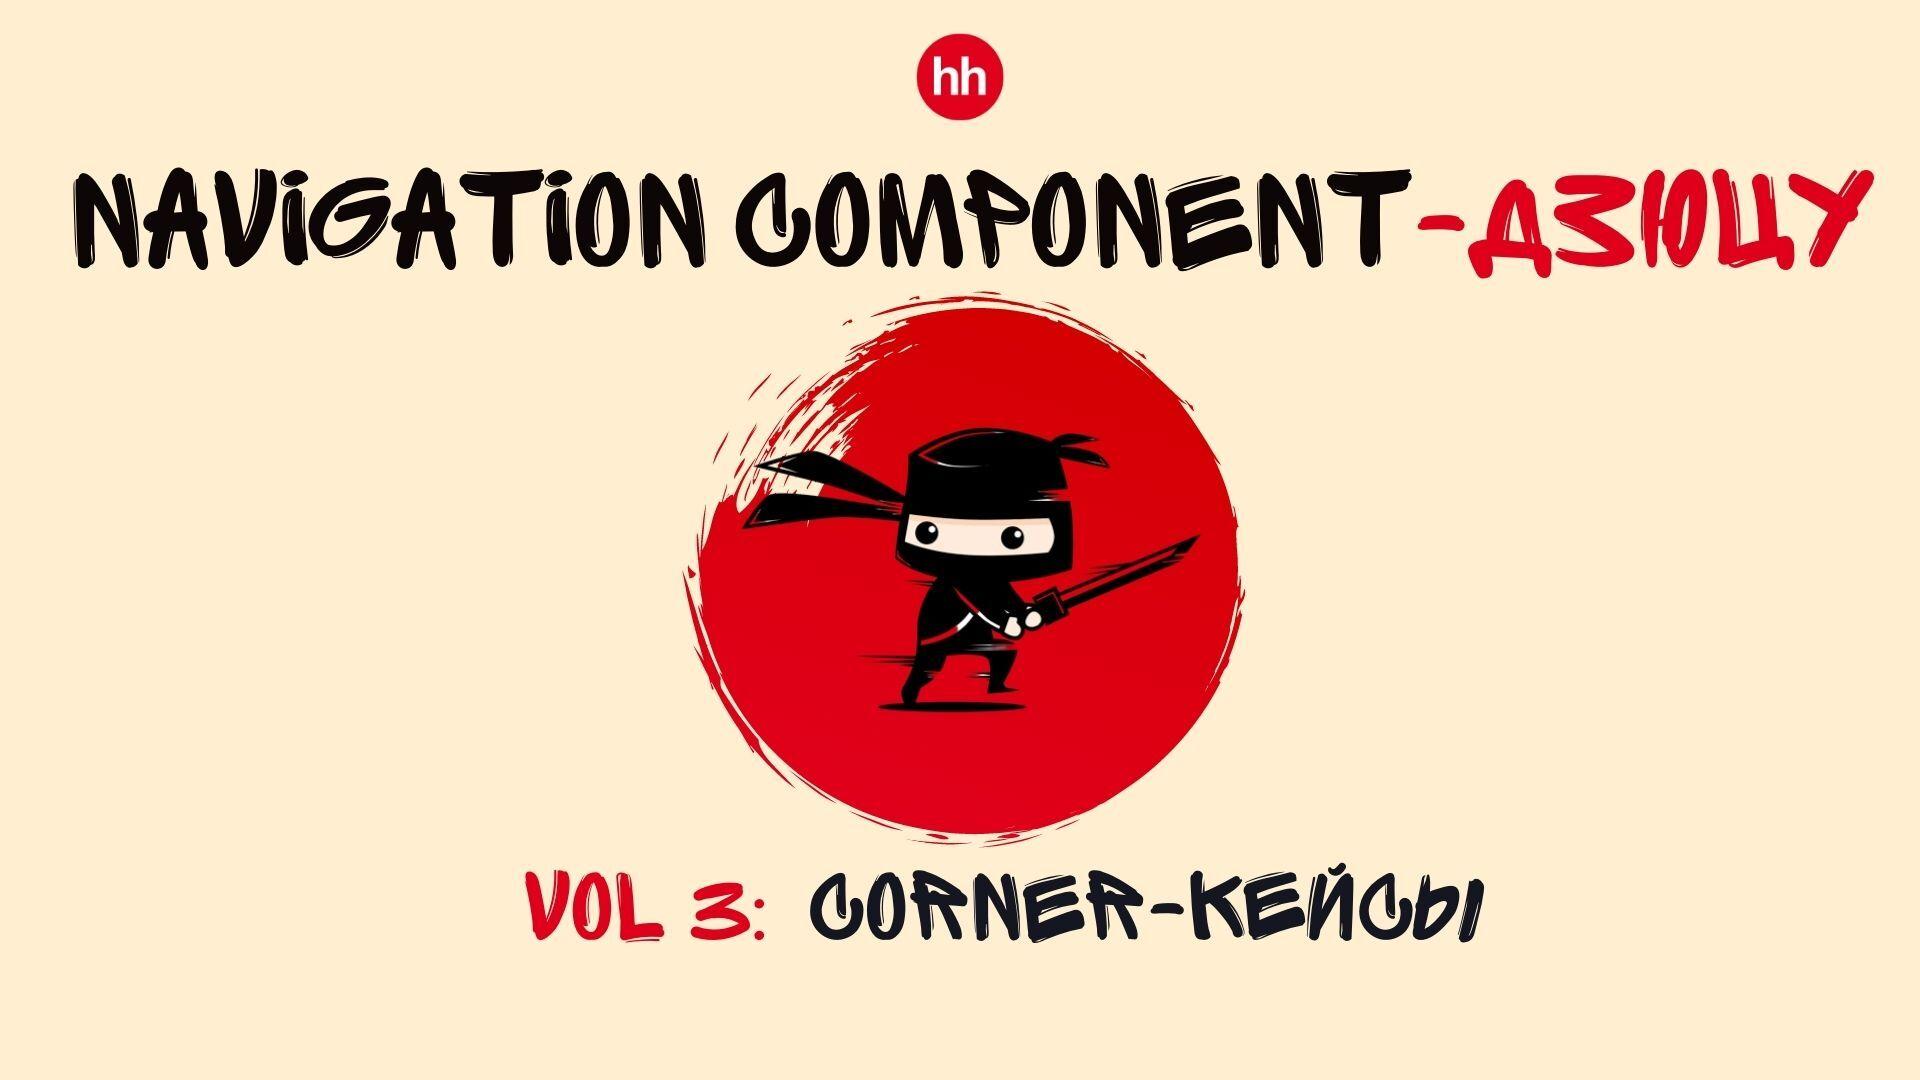 Navigation Component-дзюцу, vol. 3  Corner-кейсы